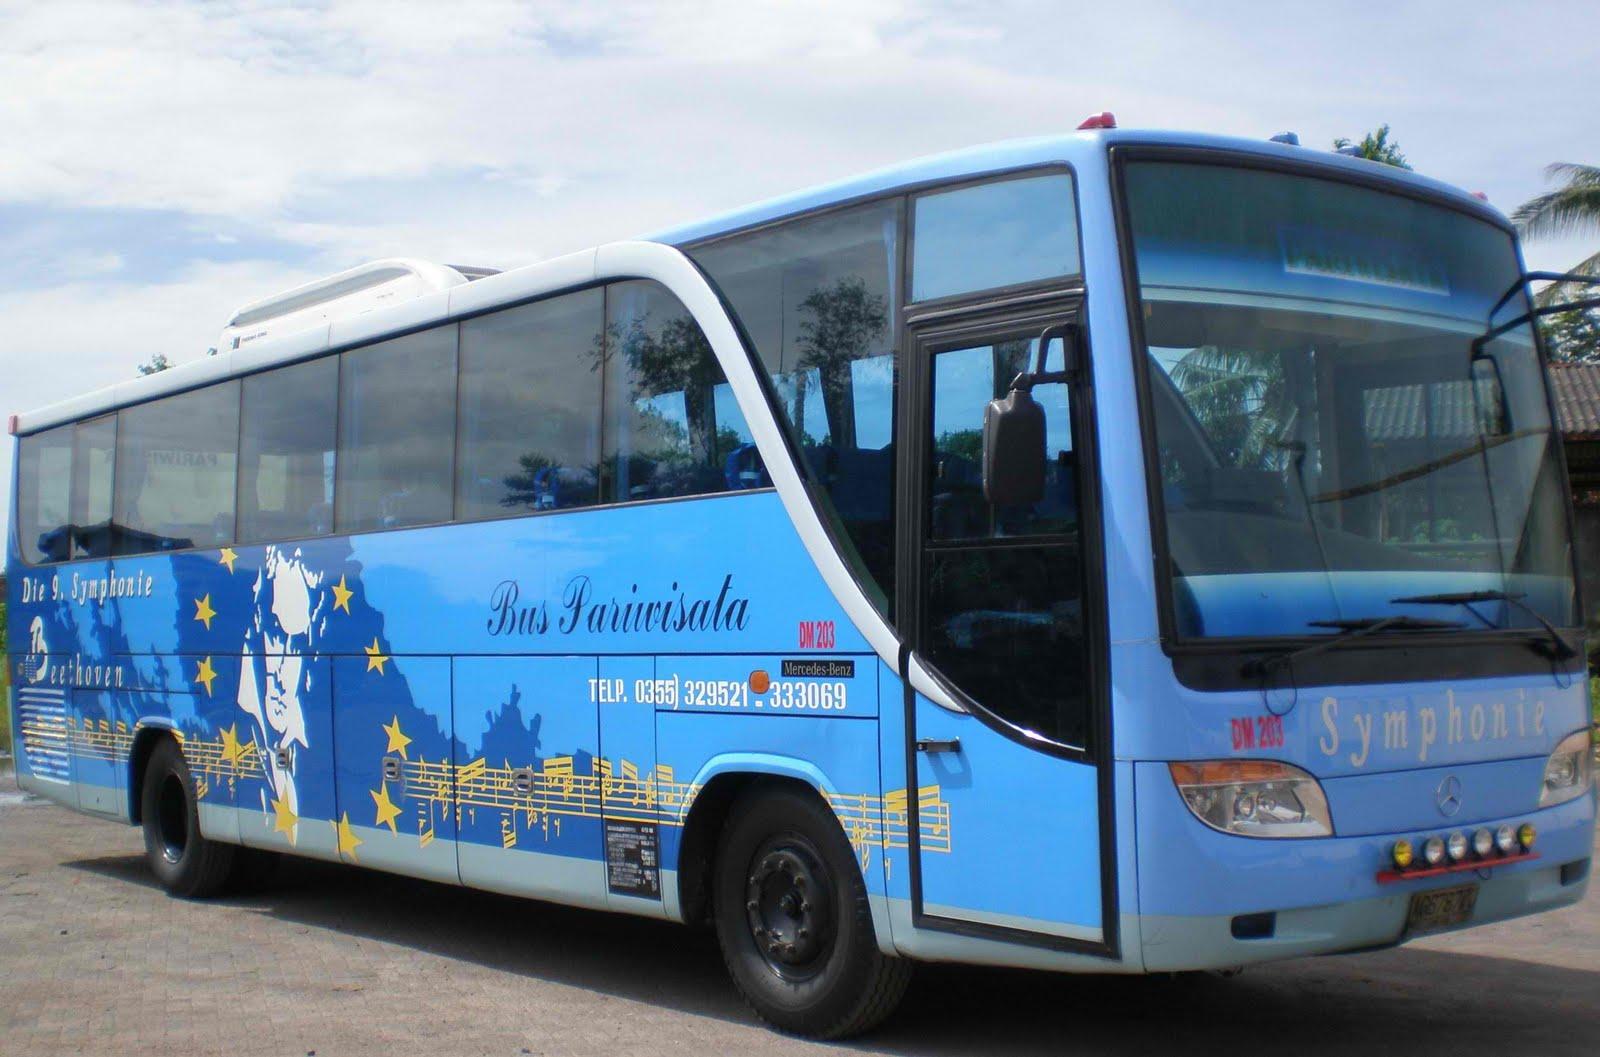 Mercedes benz popangeran tours travel bus companies for Mercedes benz tour bus